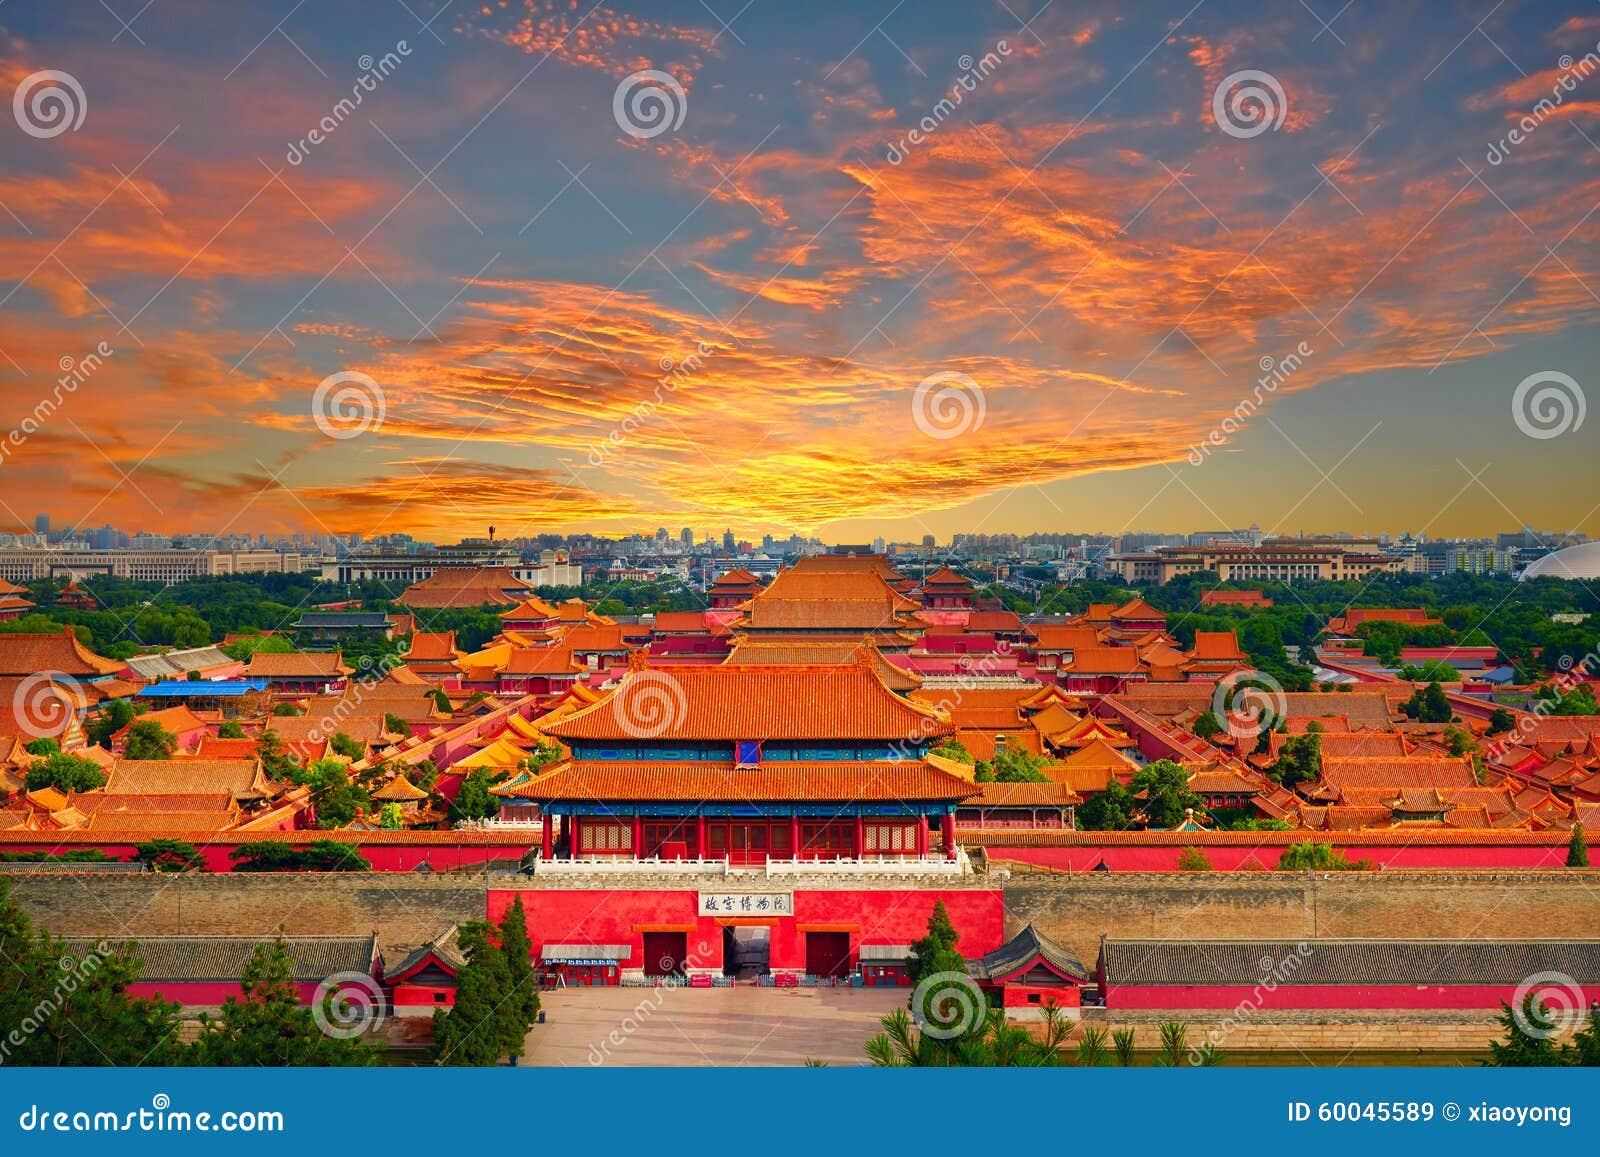 Beijing Forbidden city,China